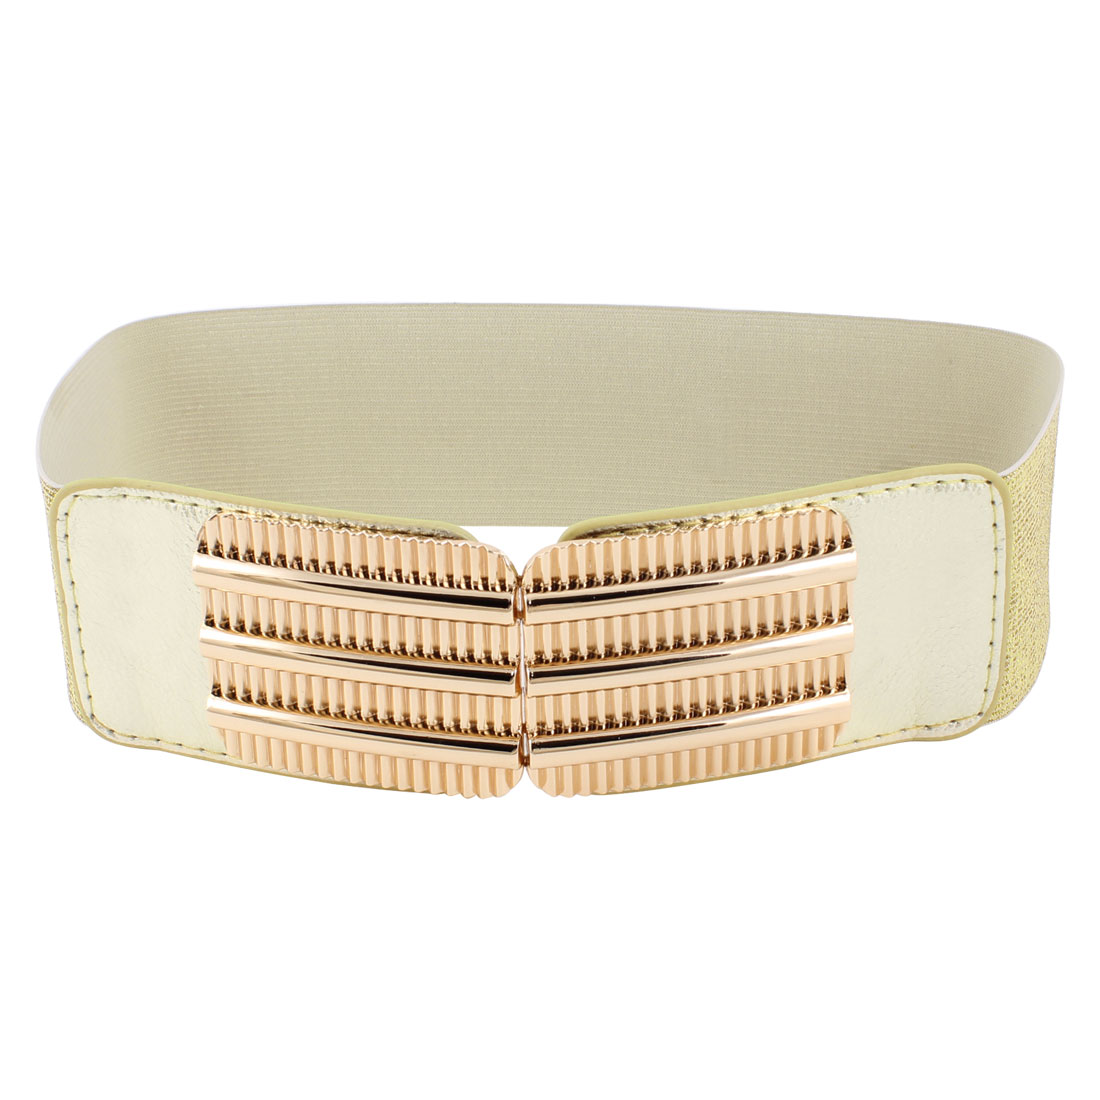 Lady Railway Design Interlocking Buckle Shiny Elastic Cinch Waist Belt Gold Tone